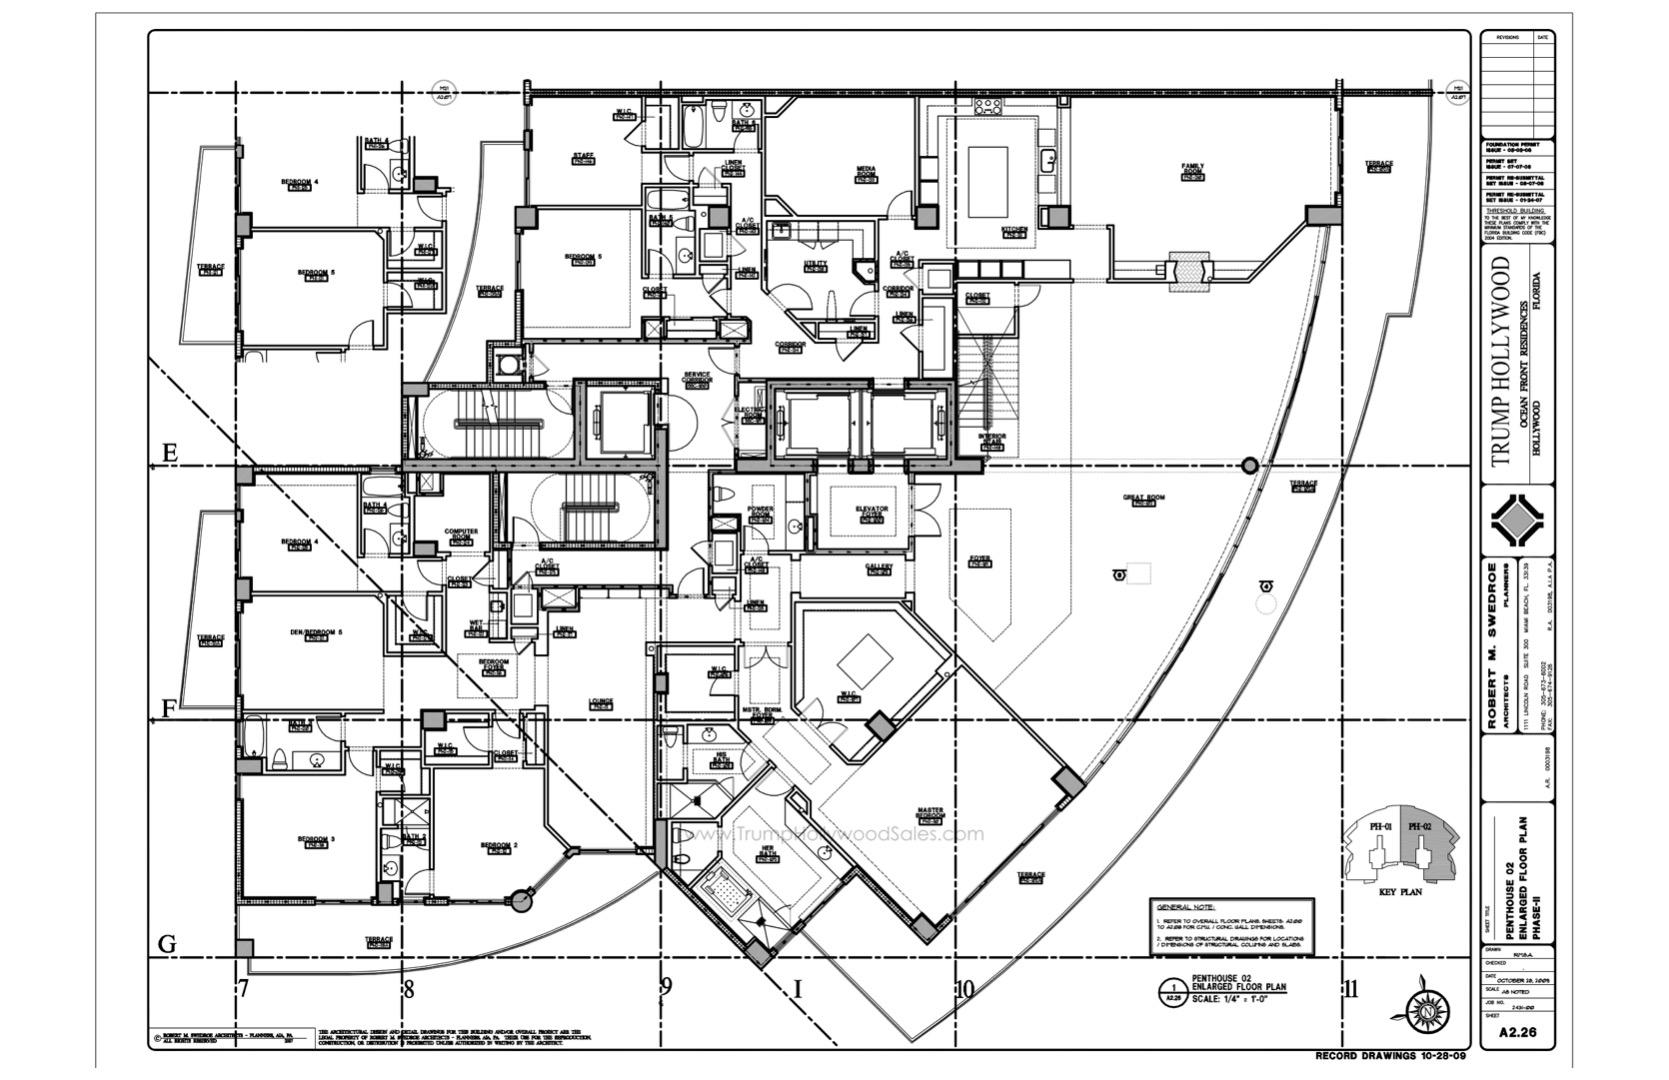 Floor plan image Upper Penthouse 02 - 6/6/1/+FamilyRoom+GreatRoom+Media+Lounge+Terrace  - 8926 sqft image